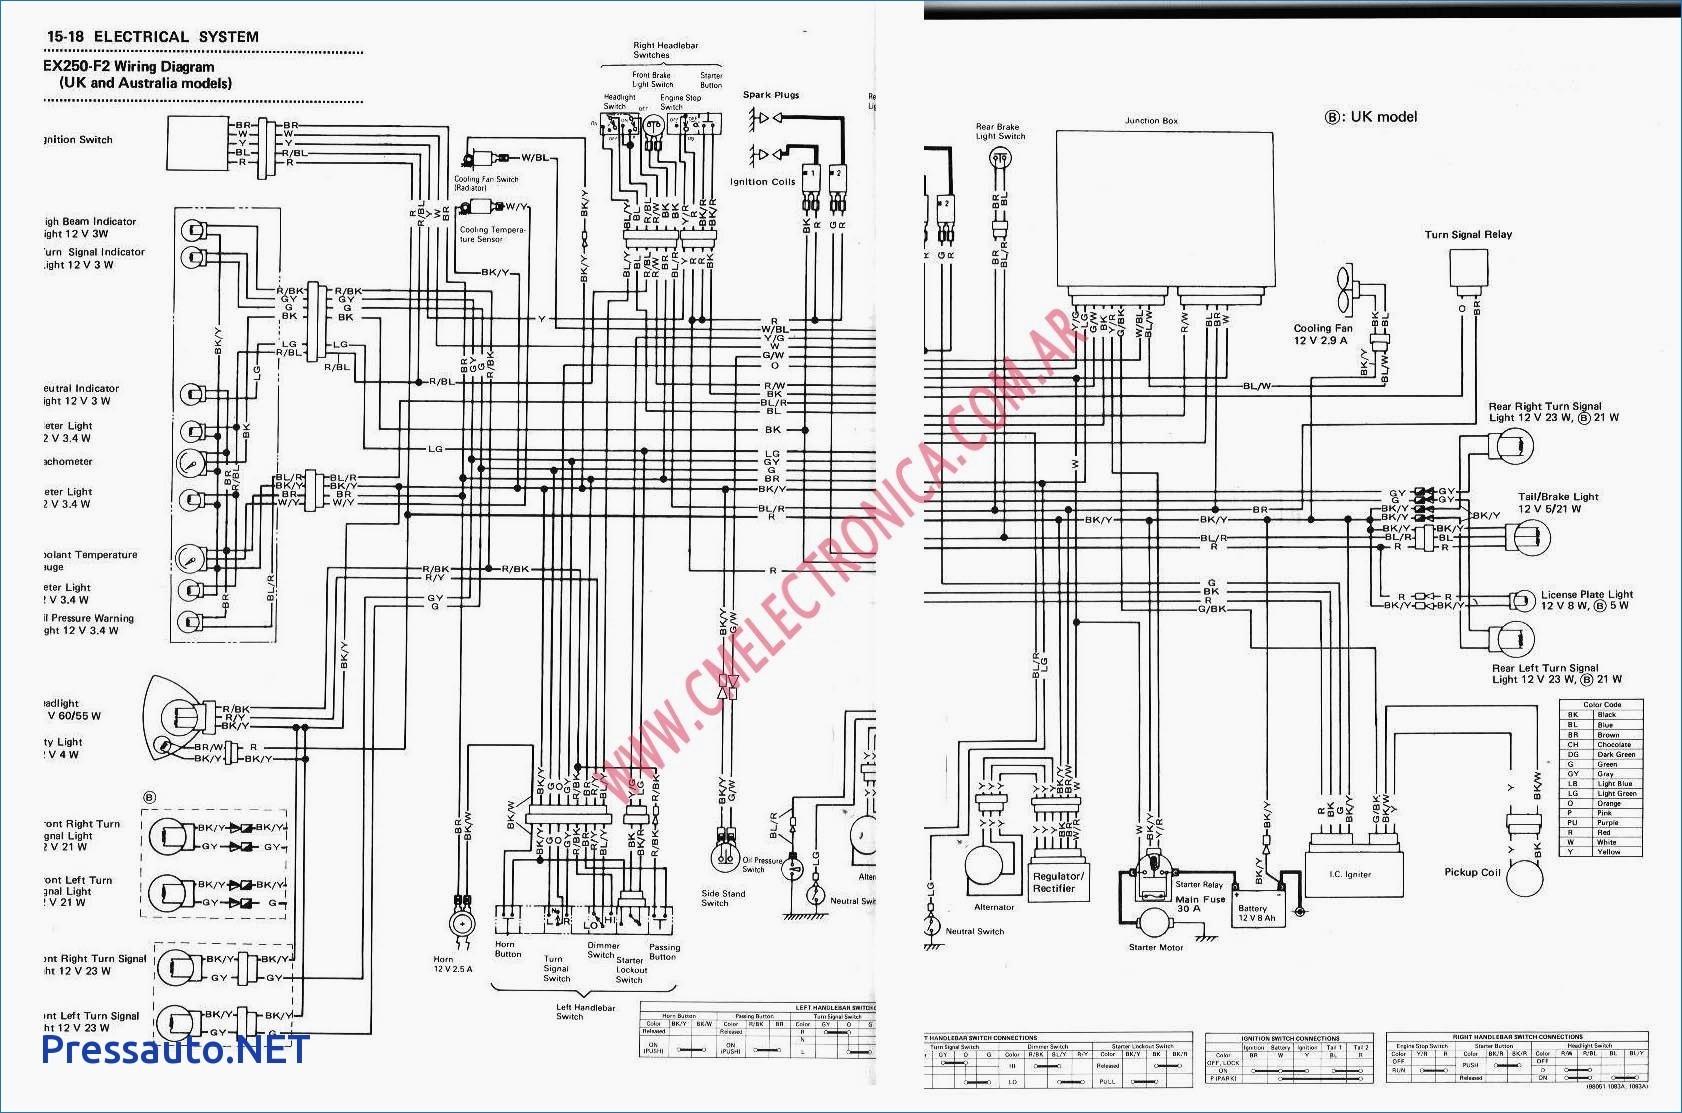 hight resolution of kawasaki klf 250 wiring schematic manual e bookwiring diagram kawasaki bayou 185 wiring diagrams konsultkawasaki bayou